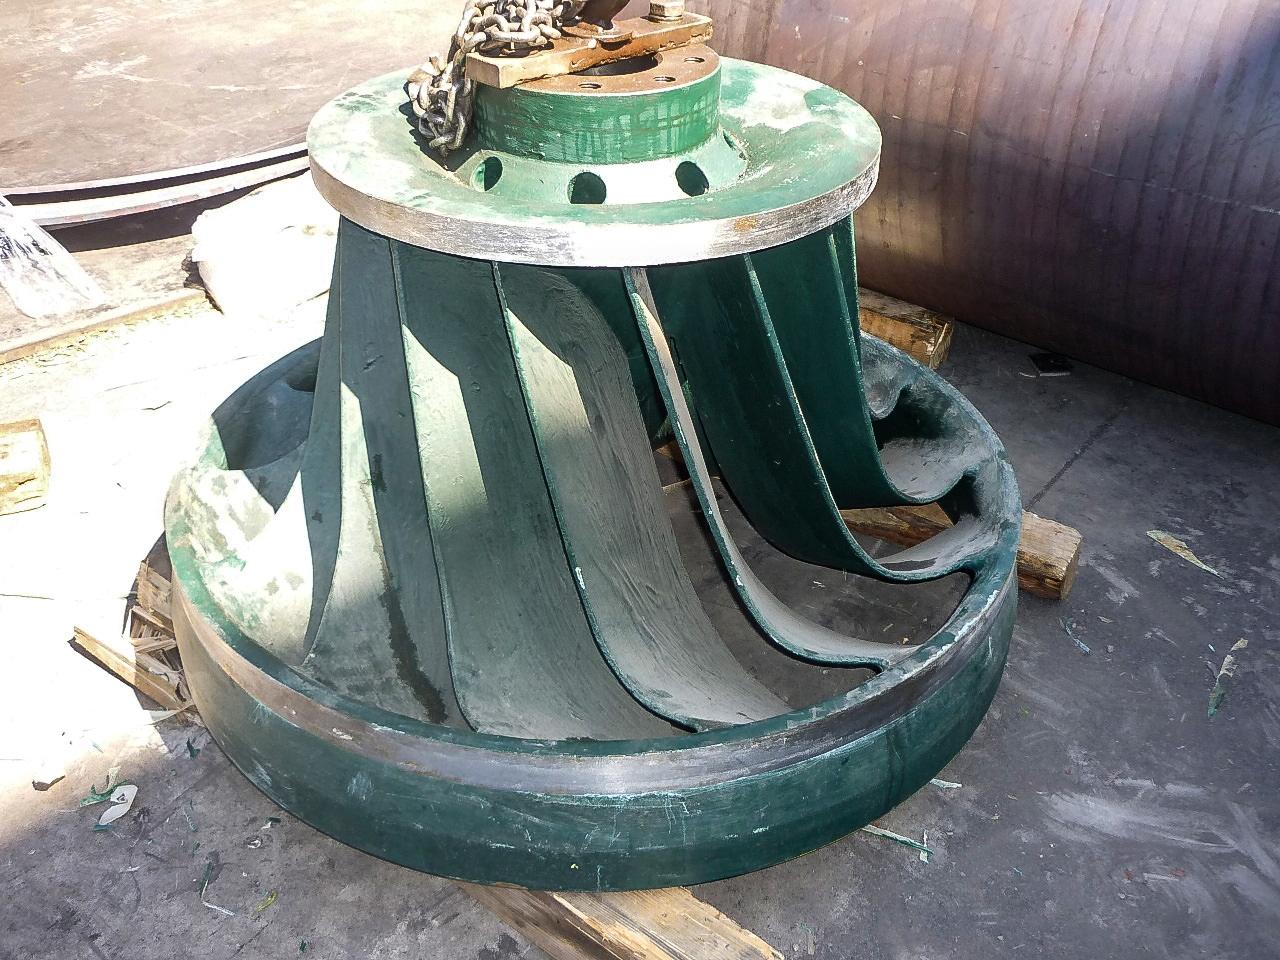 enecon-metalclad-ceramalloy-cl-ac-cp-ac-fluid-flow-pumps-turbines-42.jpg